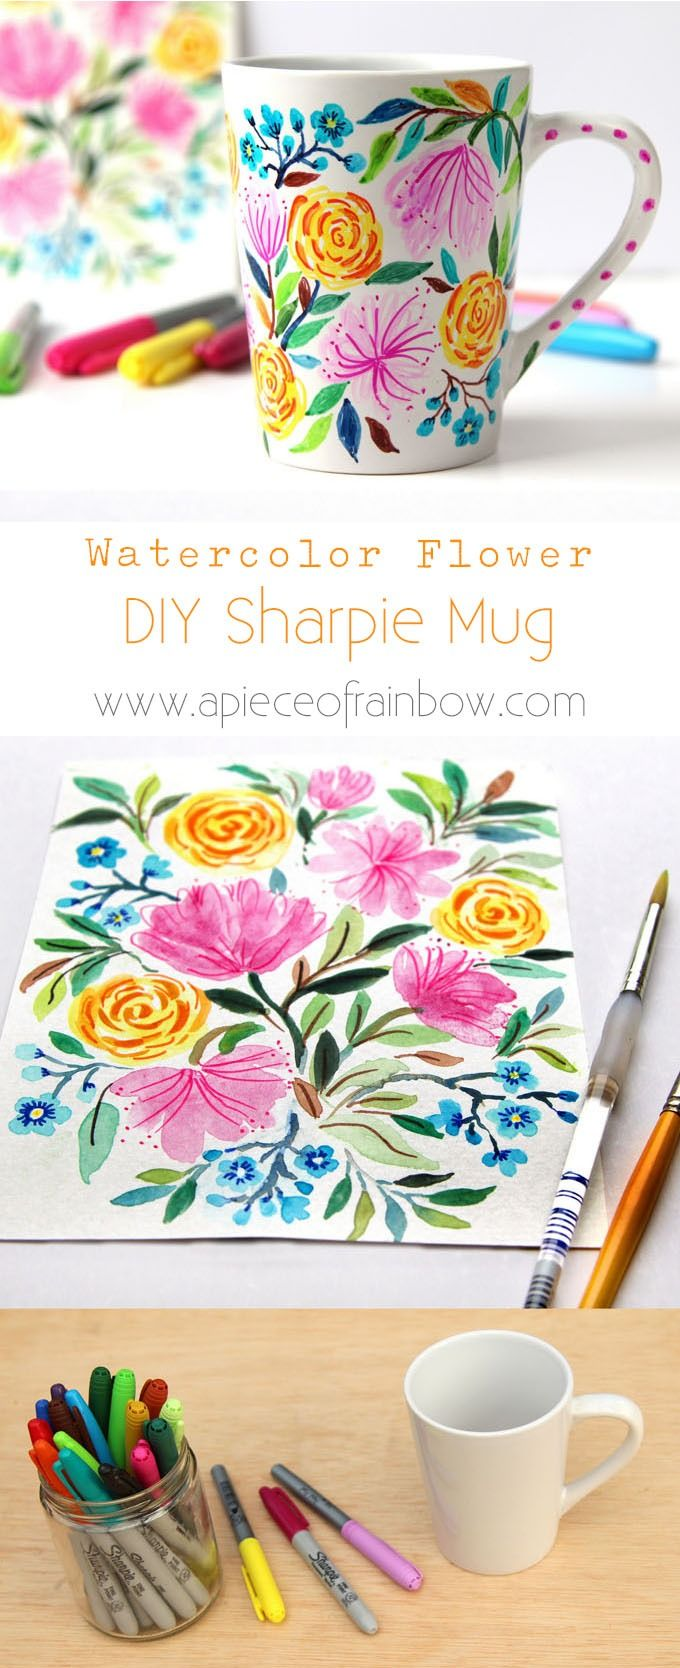 Watercolor Flower DIY Sharpie Mug - A Piece Of Rainbow